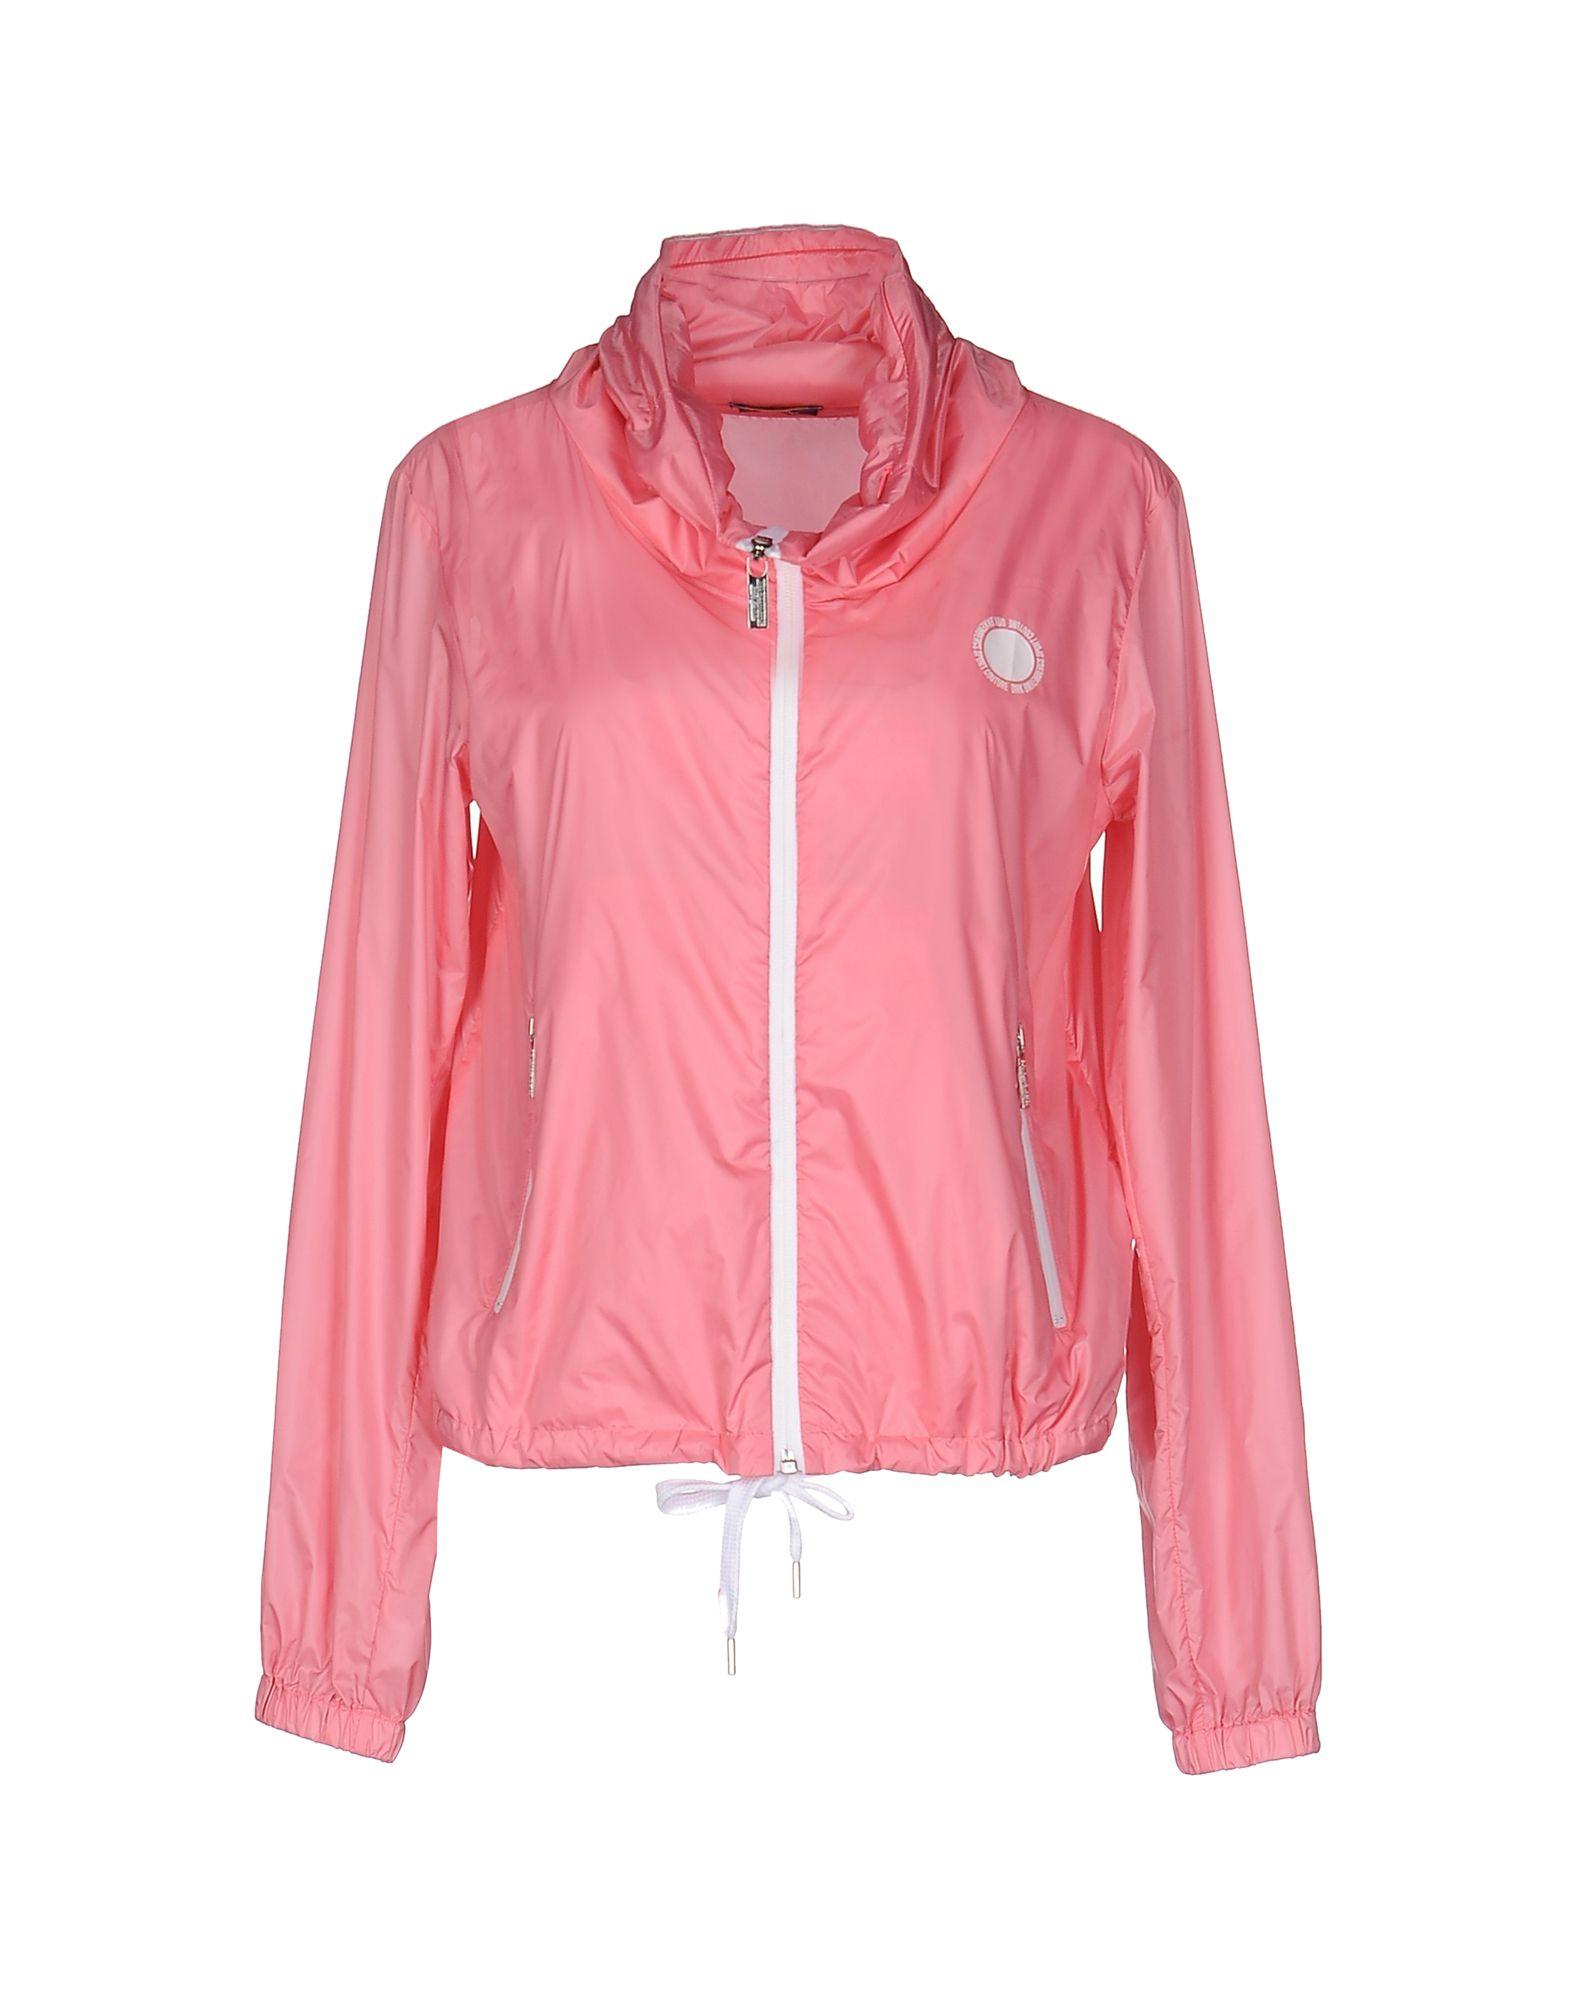 DIRK BIKKEMBERGS SPORT COUTURE Куртка dirk bikkembergs sport couture пиджак